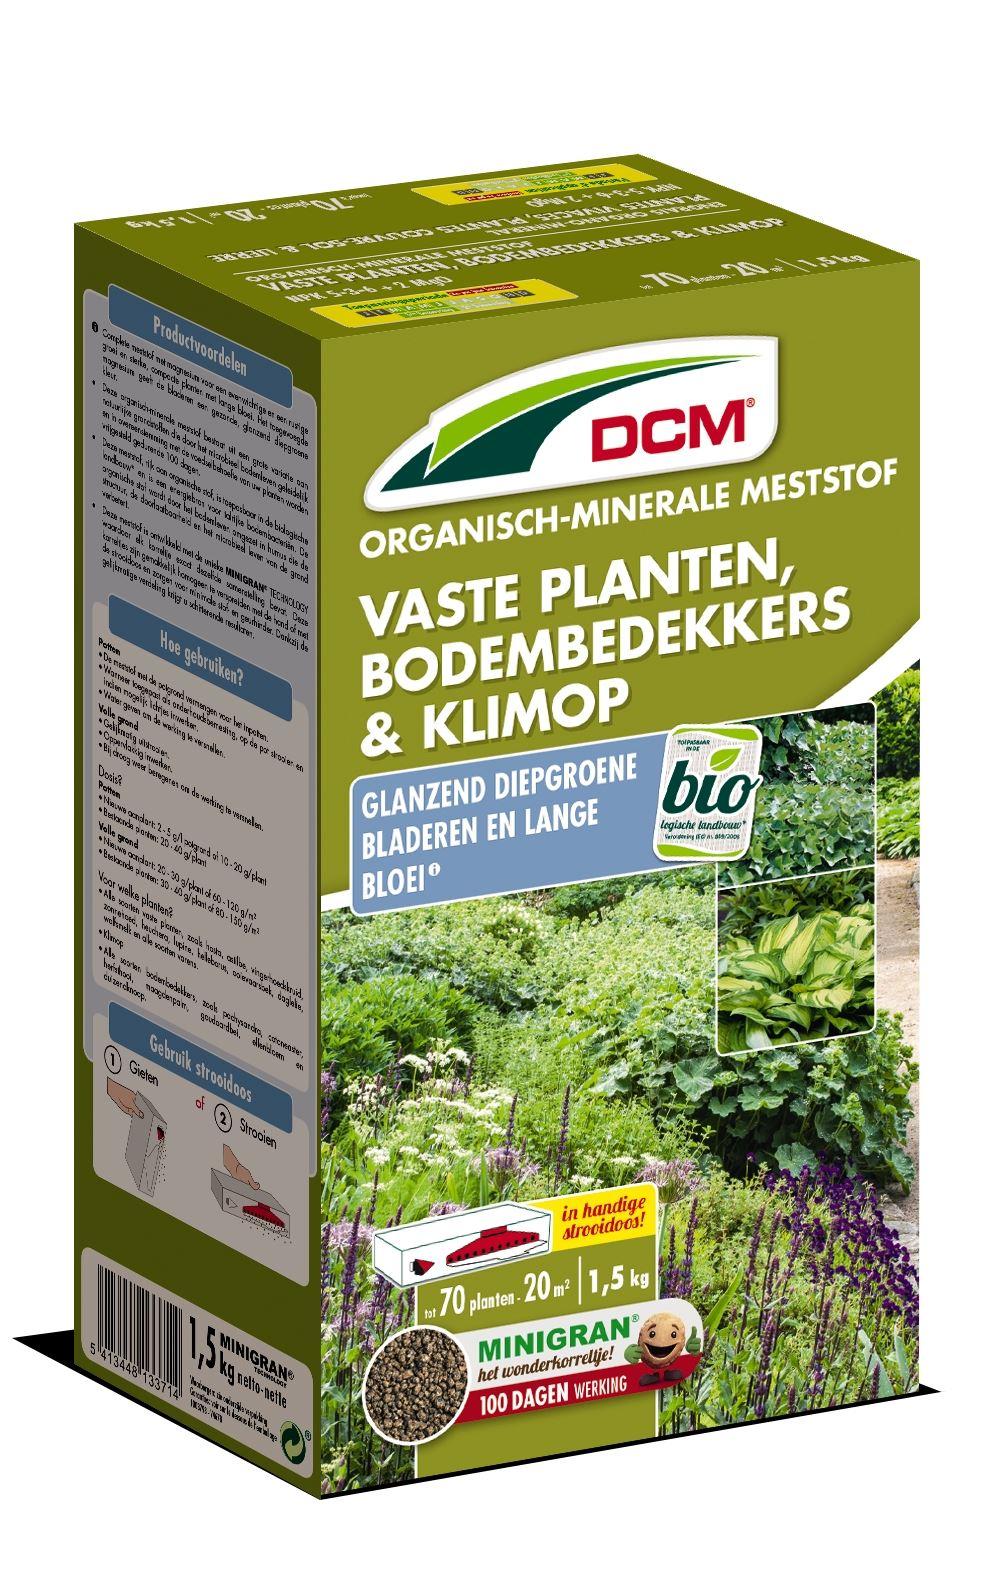 Meststof vaste planten, bodembedekkers & klimop 1,5kg - Bio